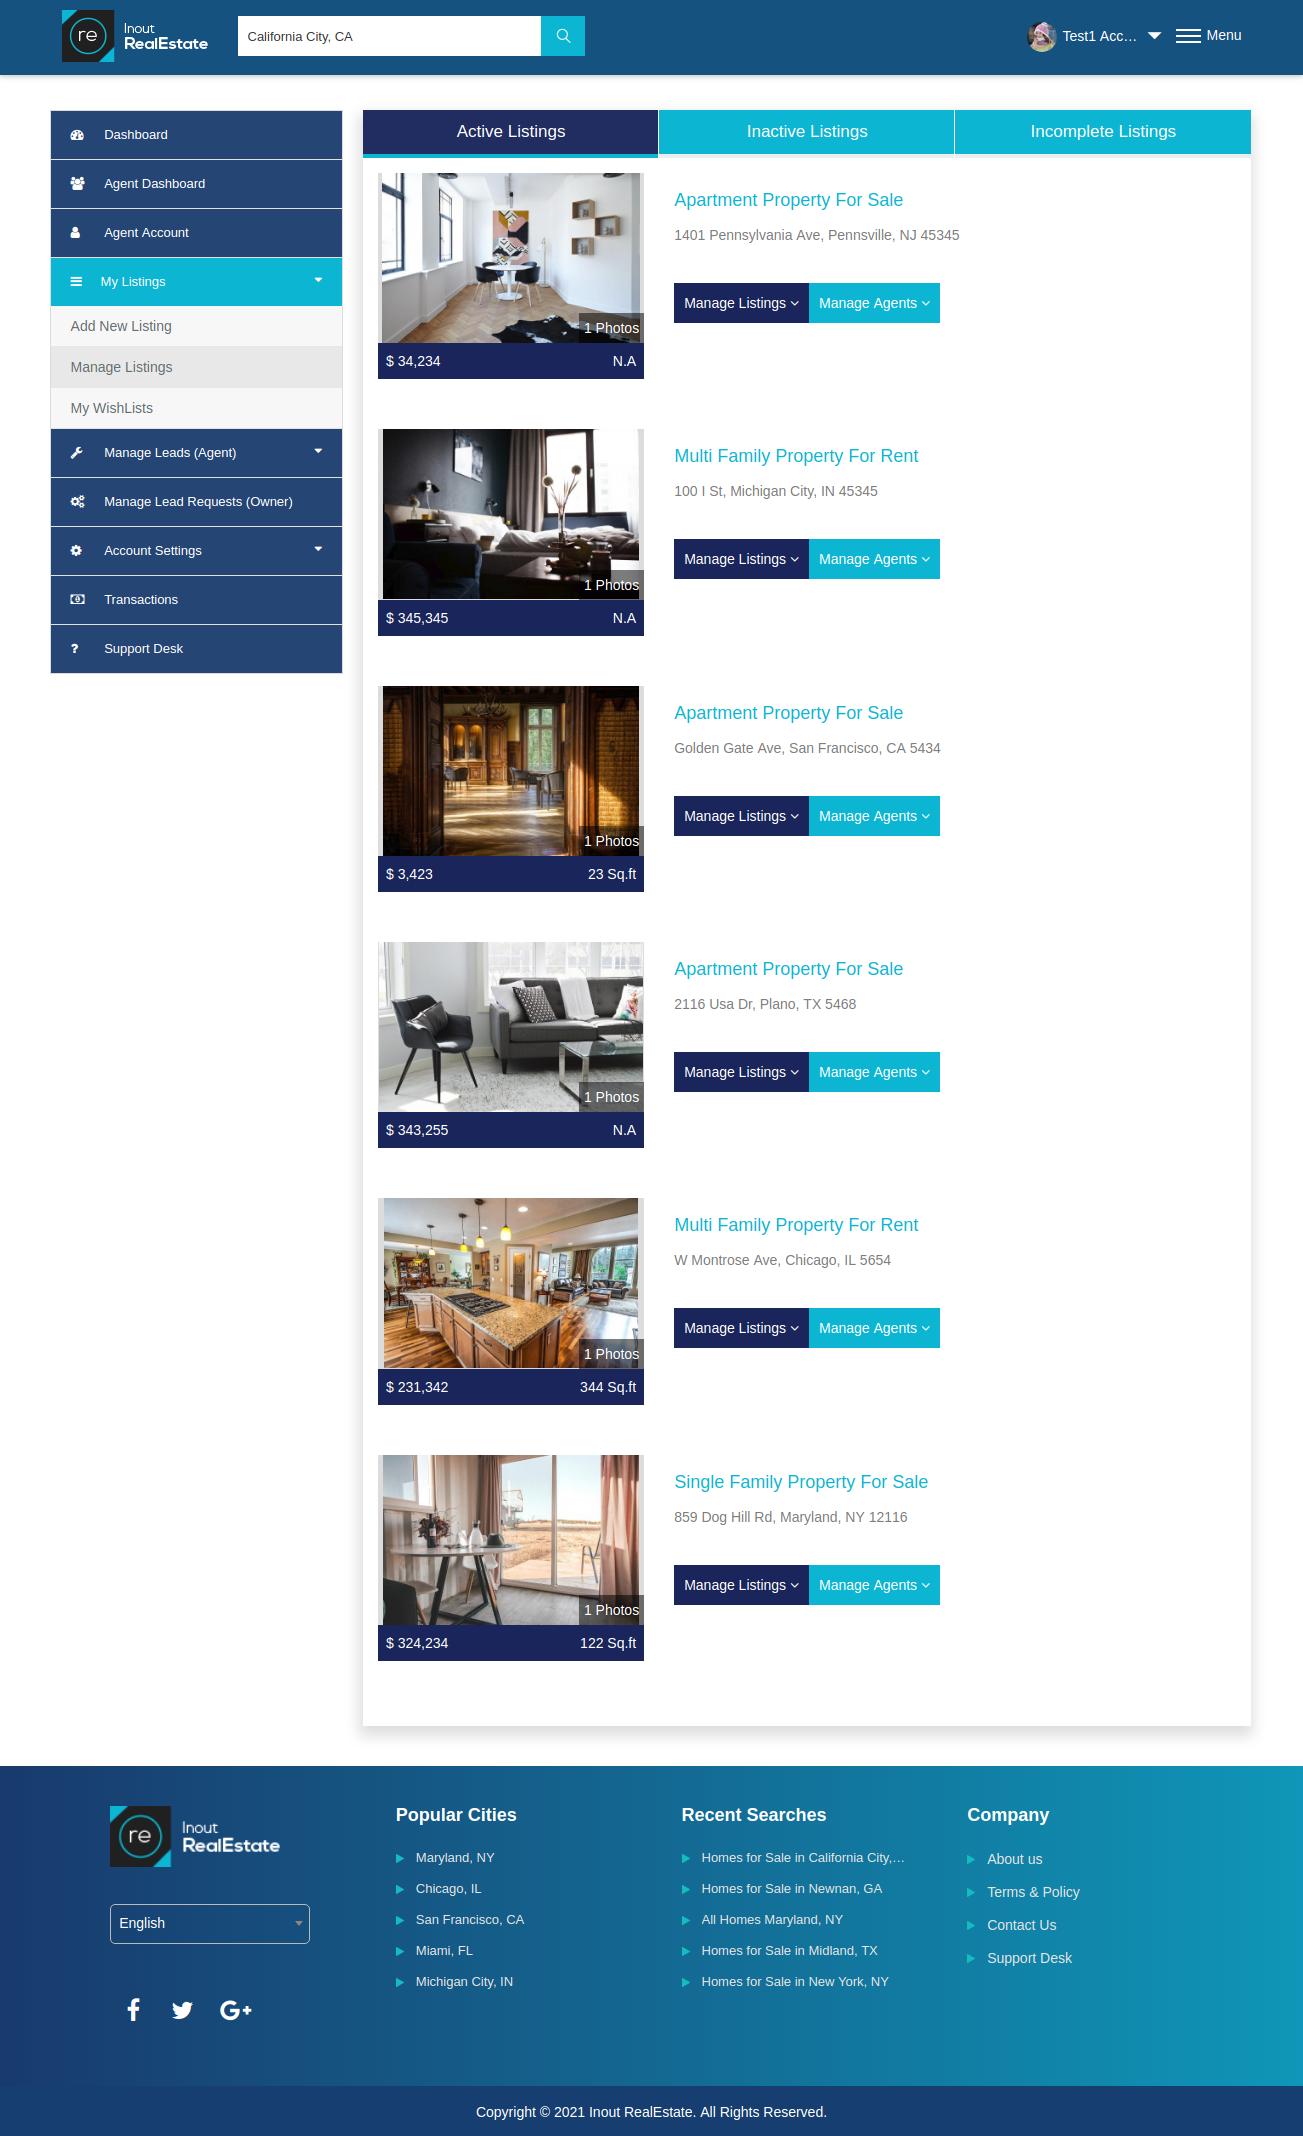 Inout RealEstate - Map Based Advanced Real Estate Portal - Screenshot 3